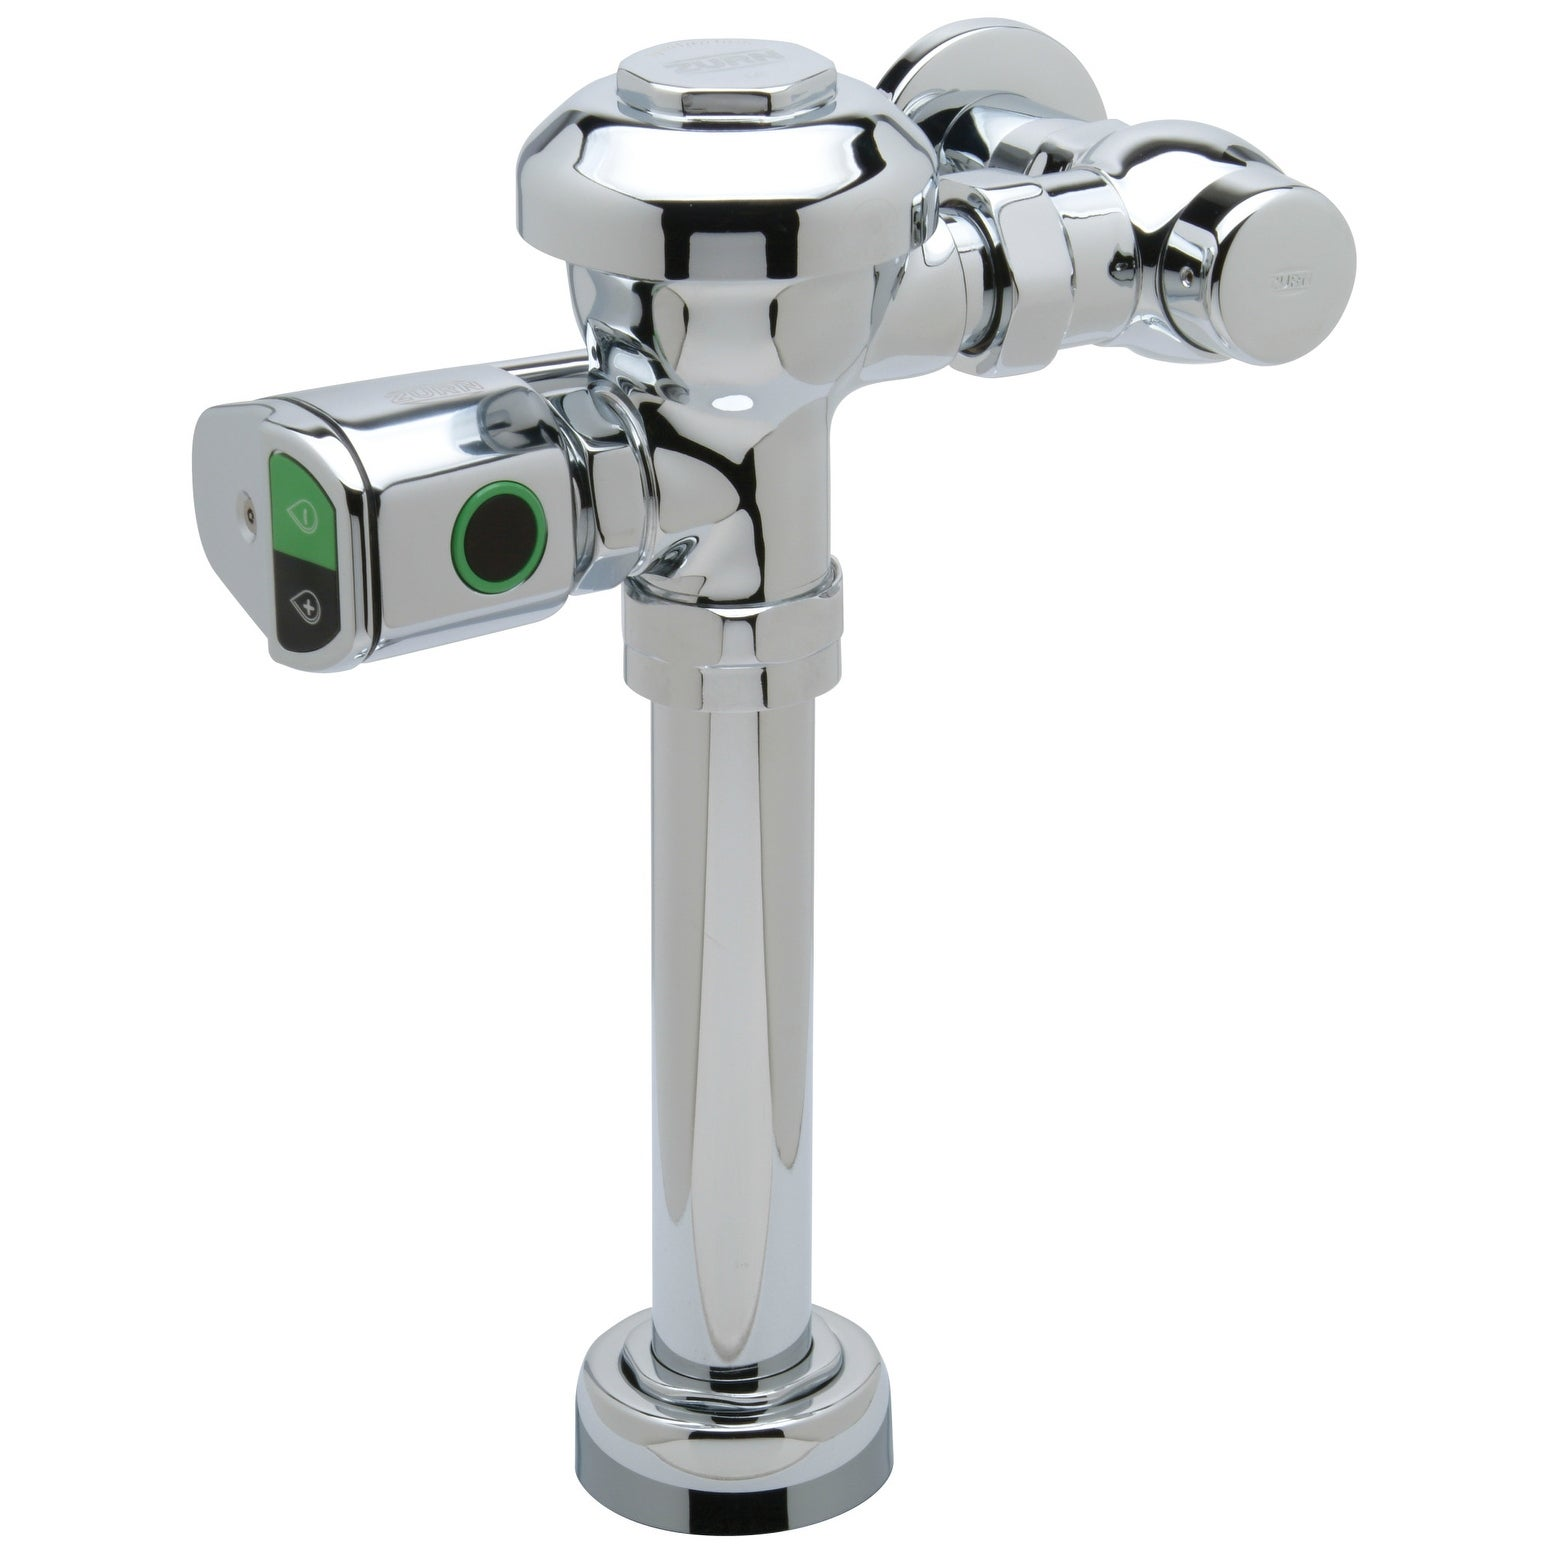 Zurn ZR6000AV-WS1-DF  AquaSense 1.0 GPF Sensor Operated Battery Powered Flush Valve for Water Closets with Dual Flush - Chrome